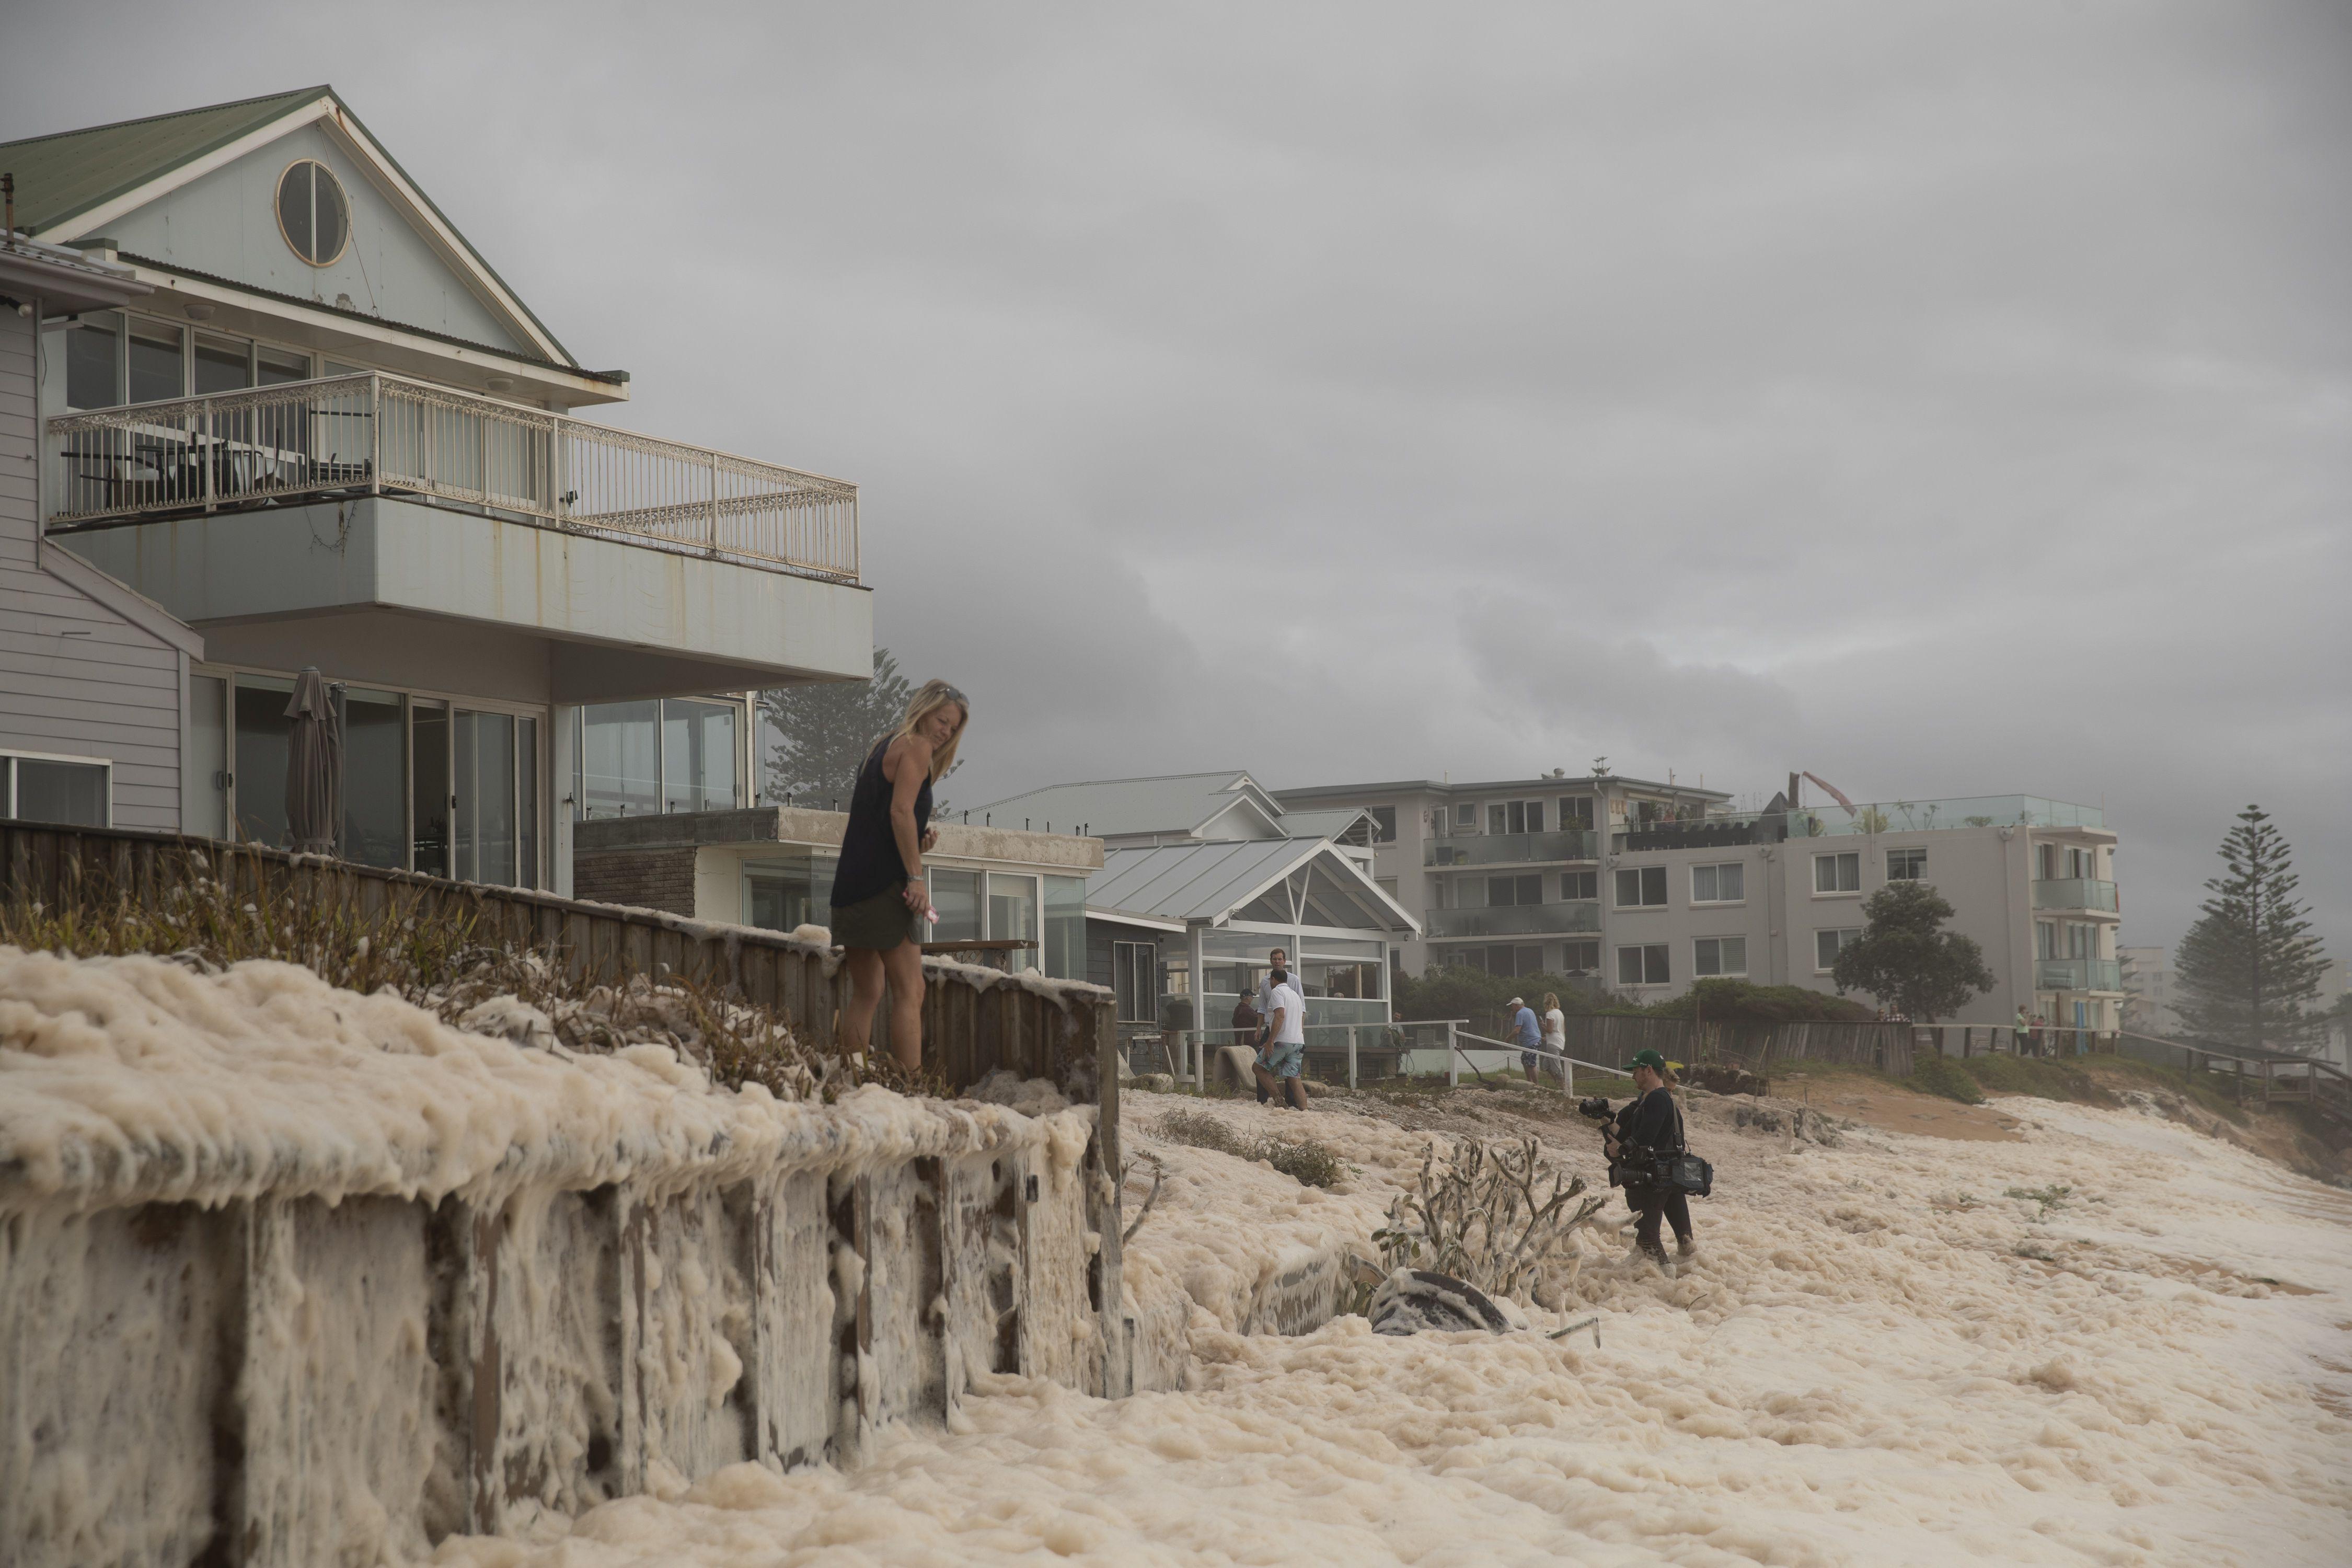 In photos: Australia's fire-ravaged east coast hit by heavy rain and floods - Axios